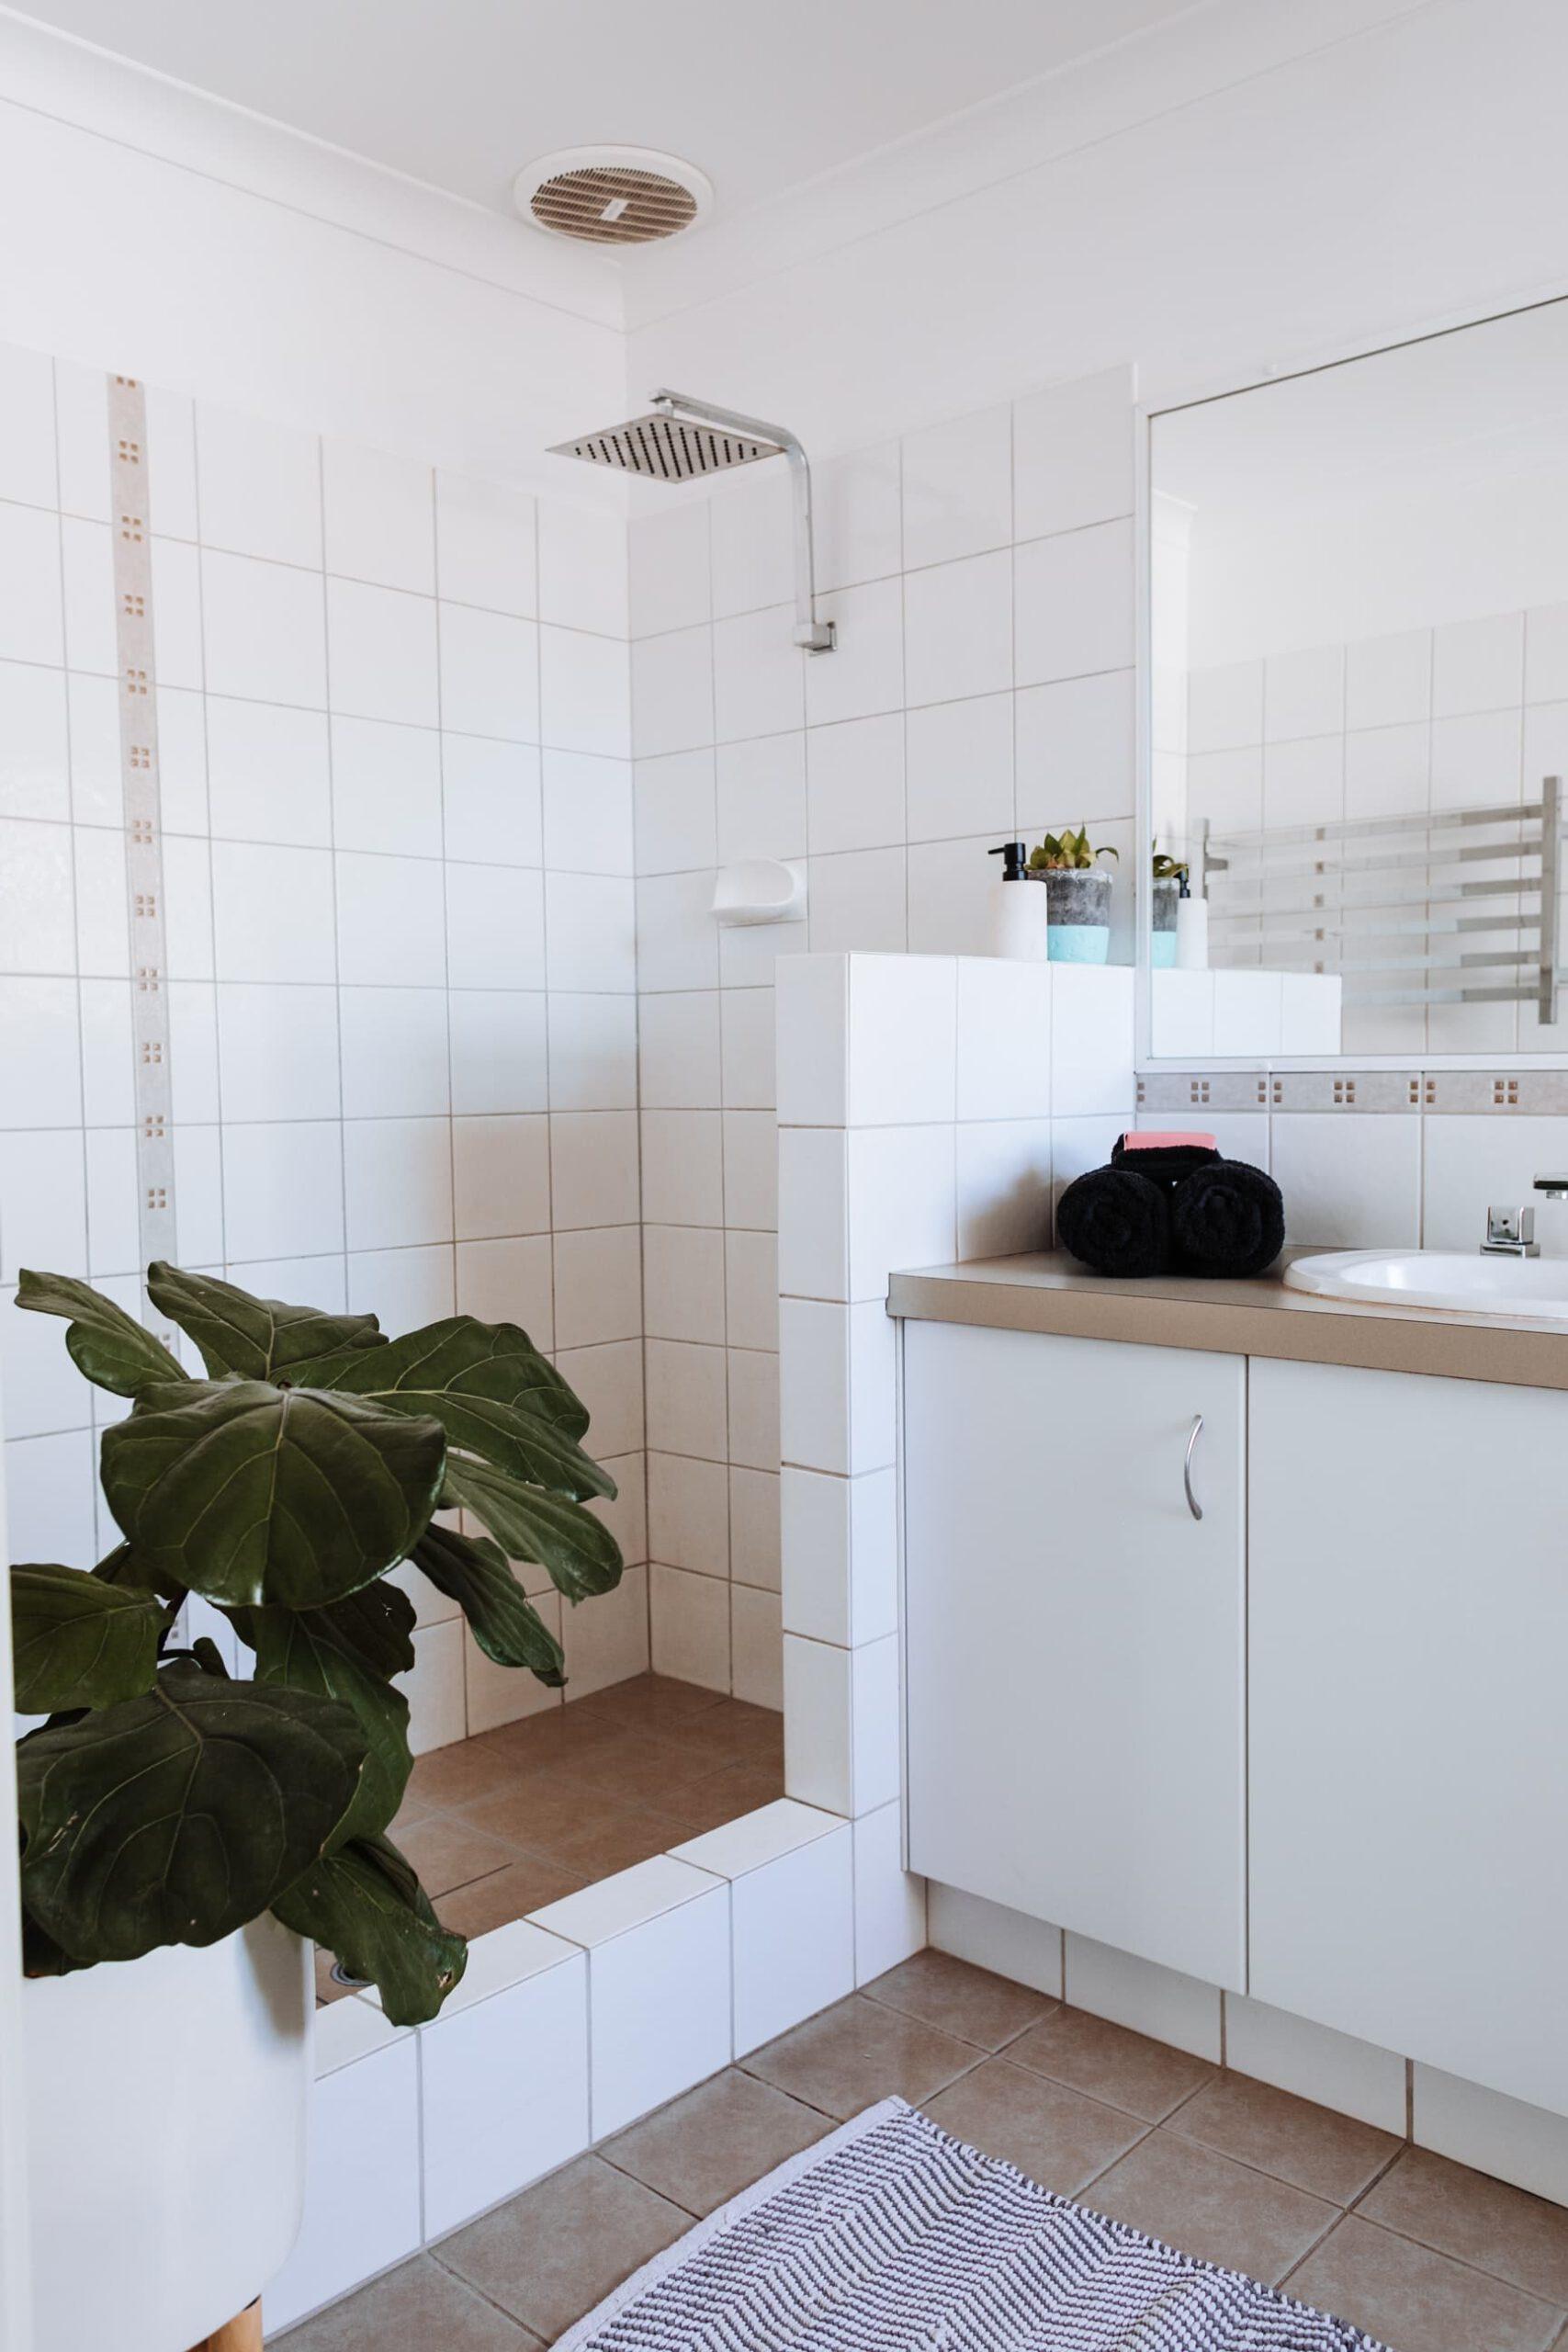 cement threshold - bathroom accessories